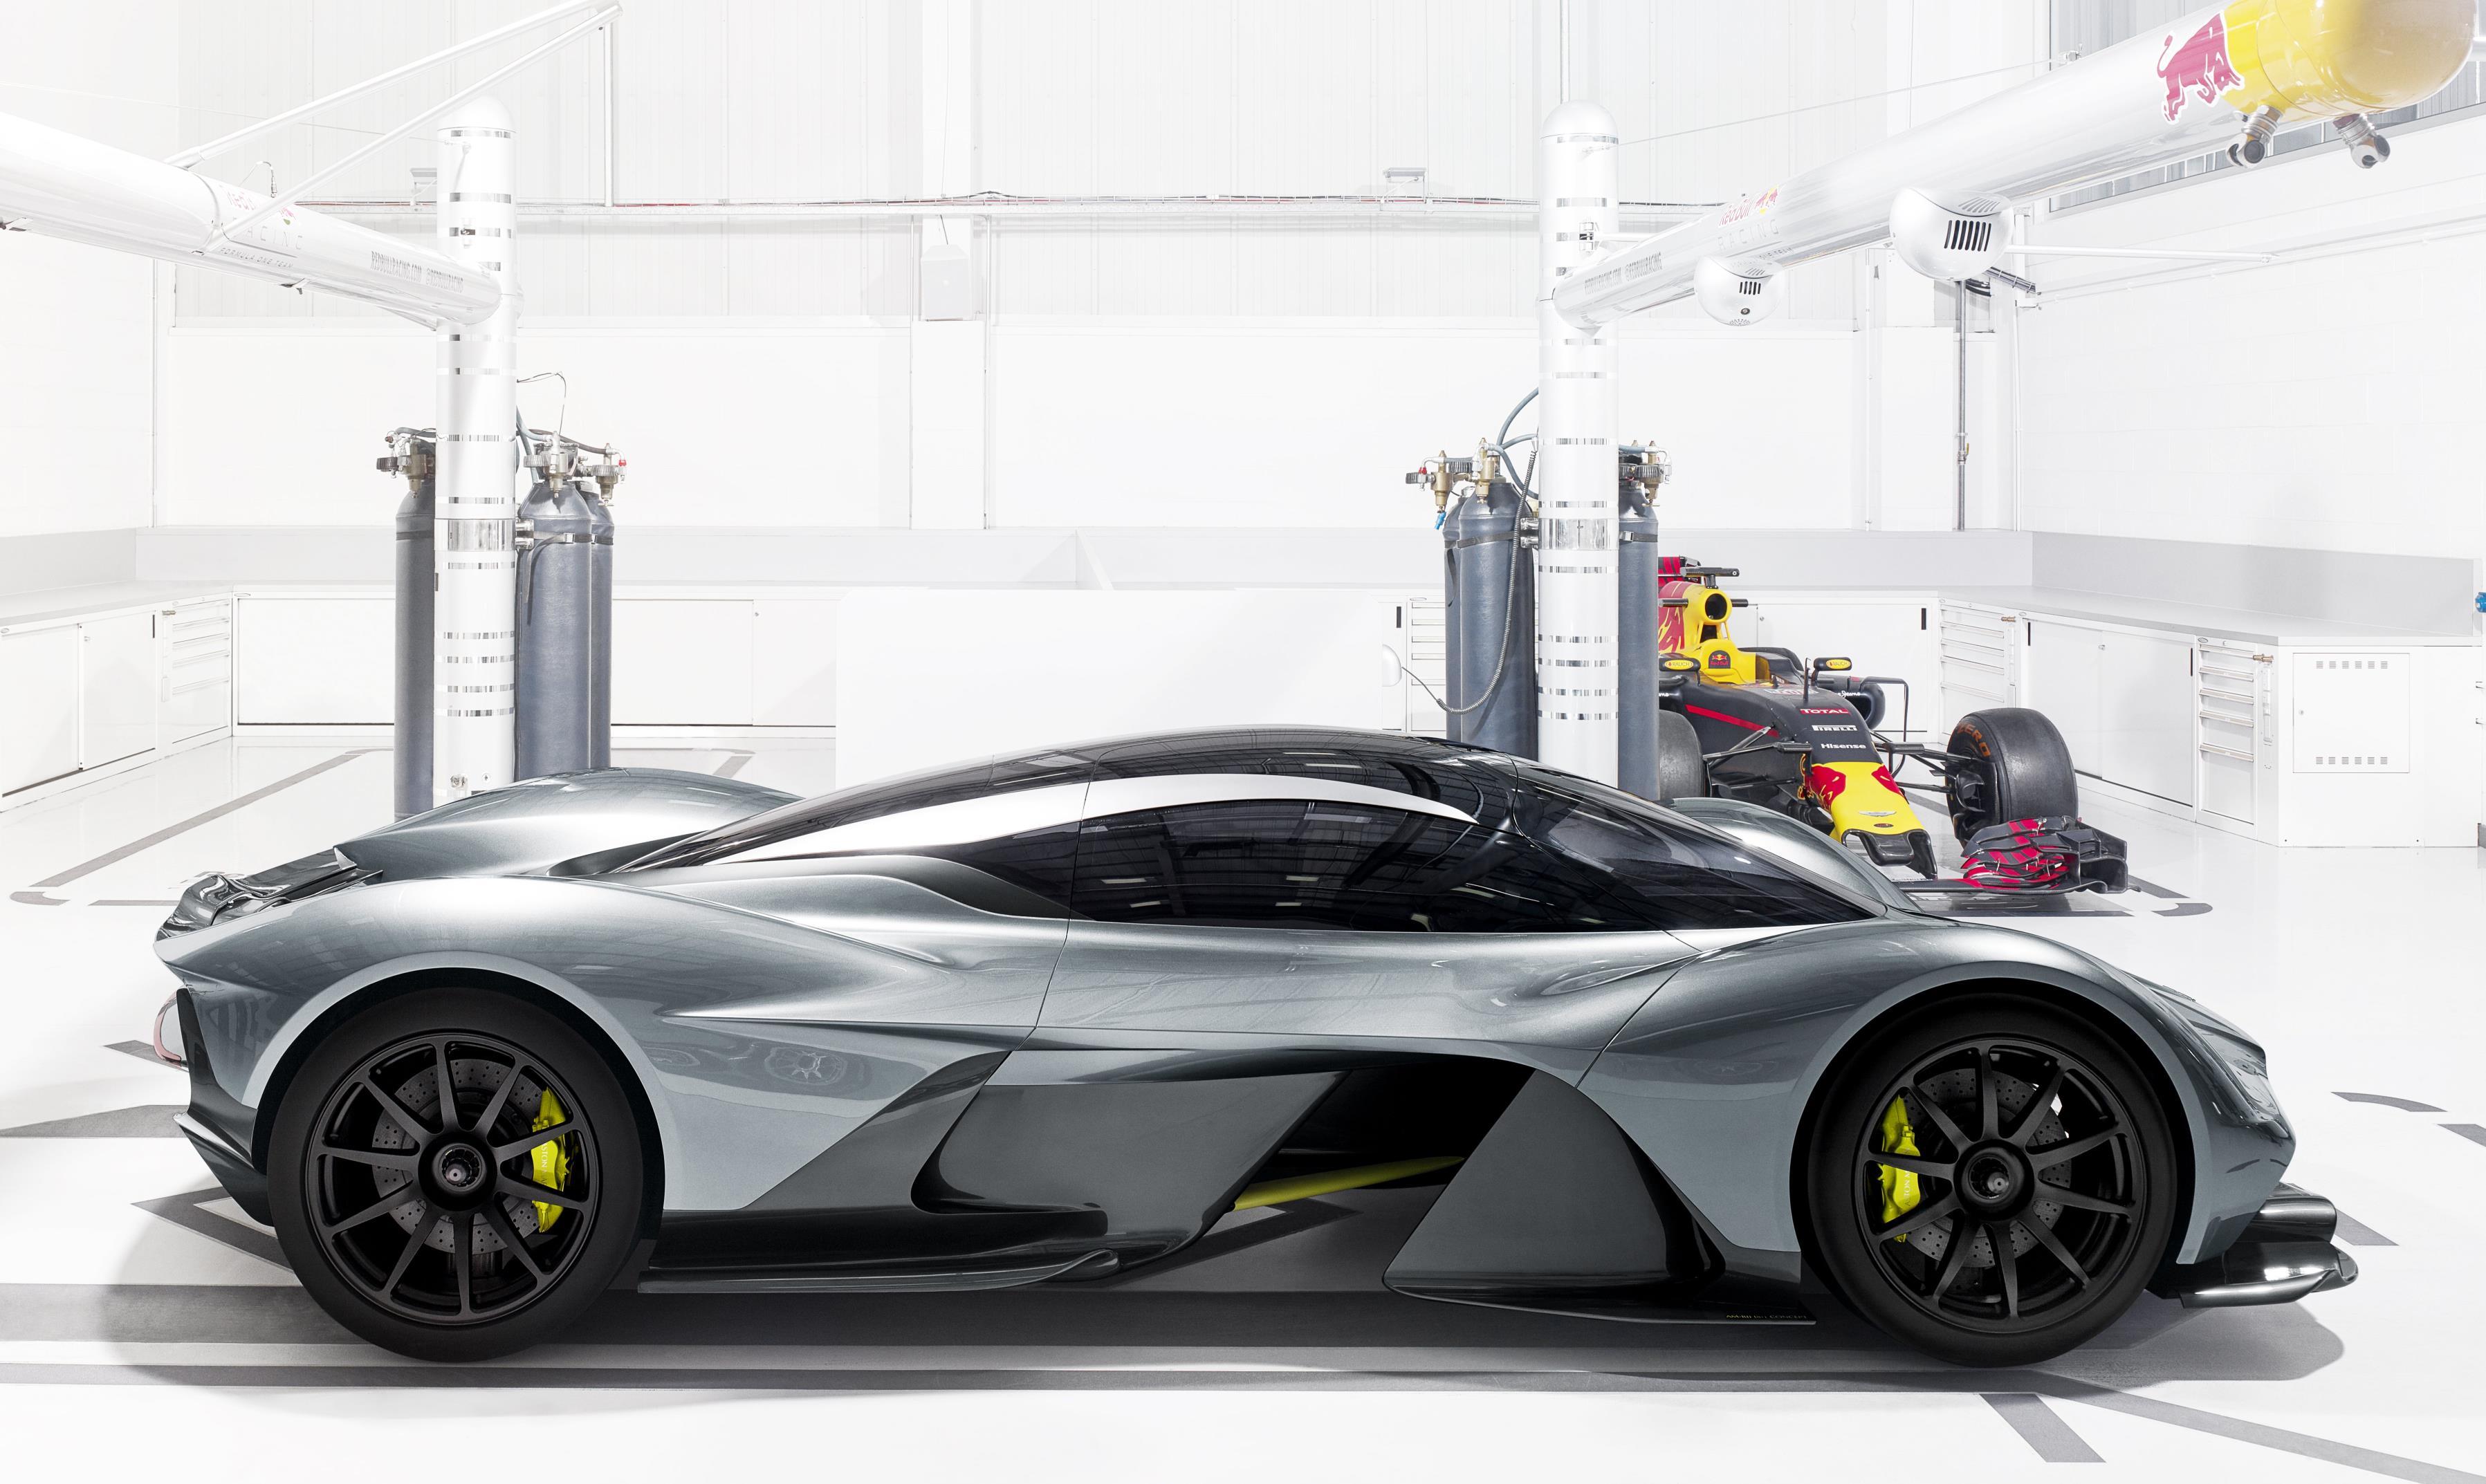 Aston Martin - Red Bull AM-RB 001